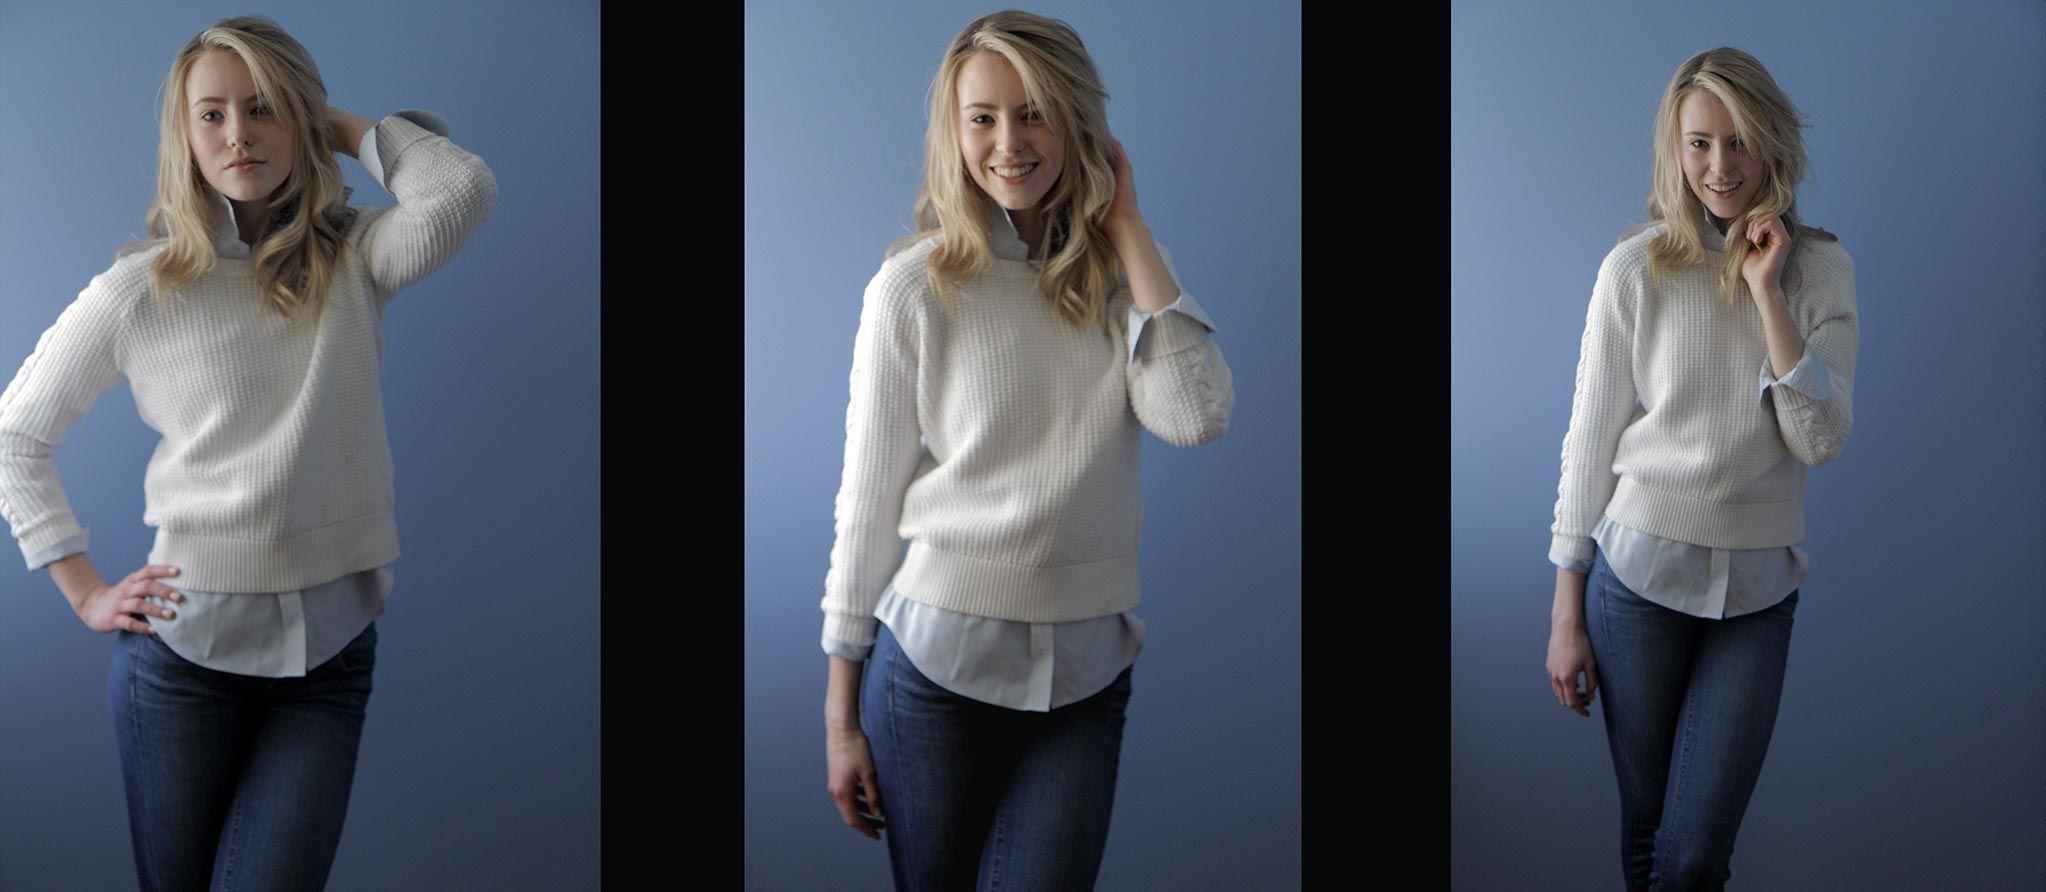 Photographer: David William Fuller Model: Ellie @agencygalatea Chicago HMUA: Gianna Carpanzano #chicagofashionphotographer #chicagomodels  www.davidwilliamfuller.com